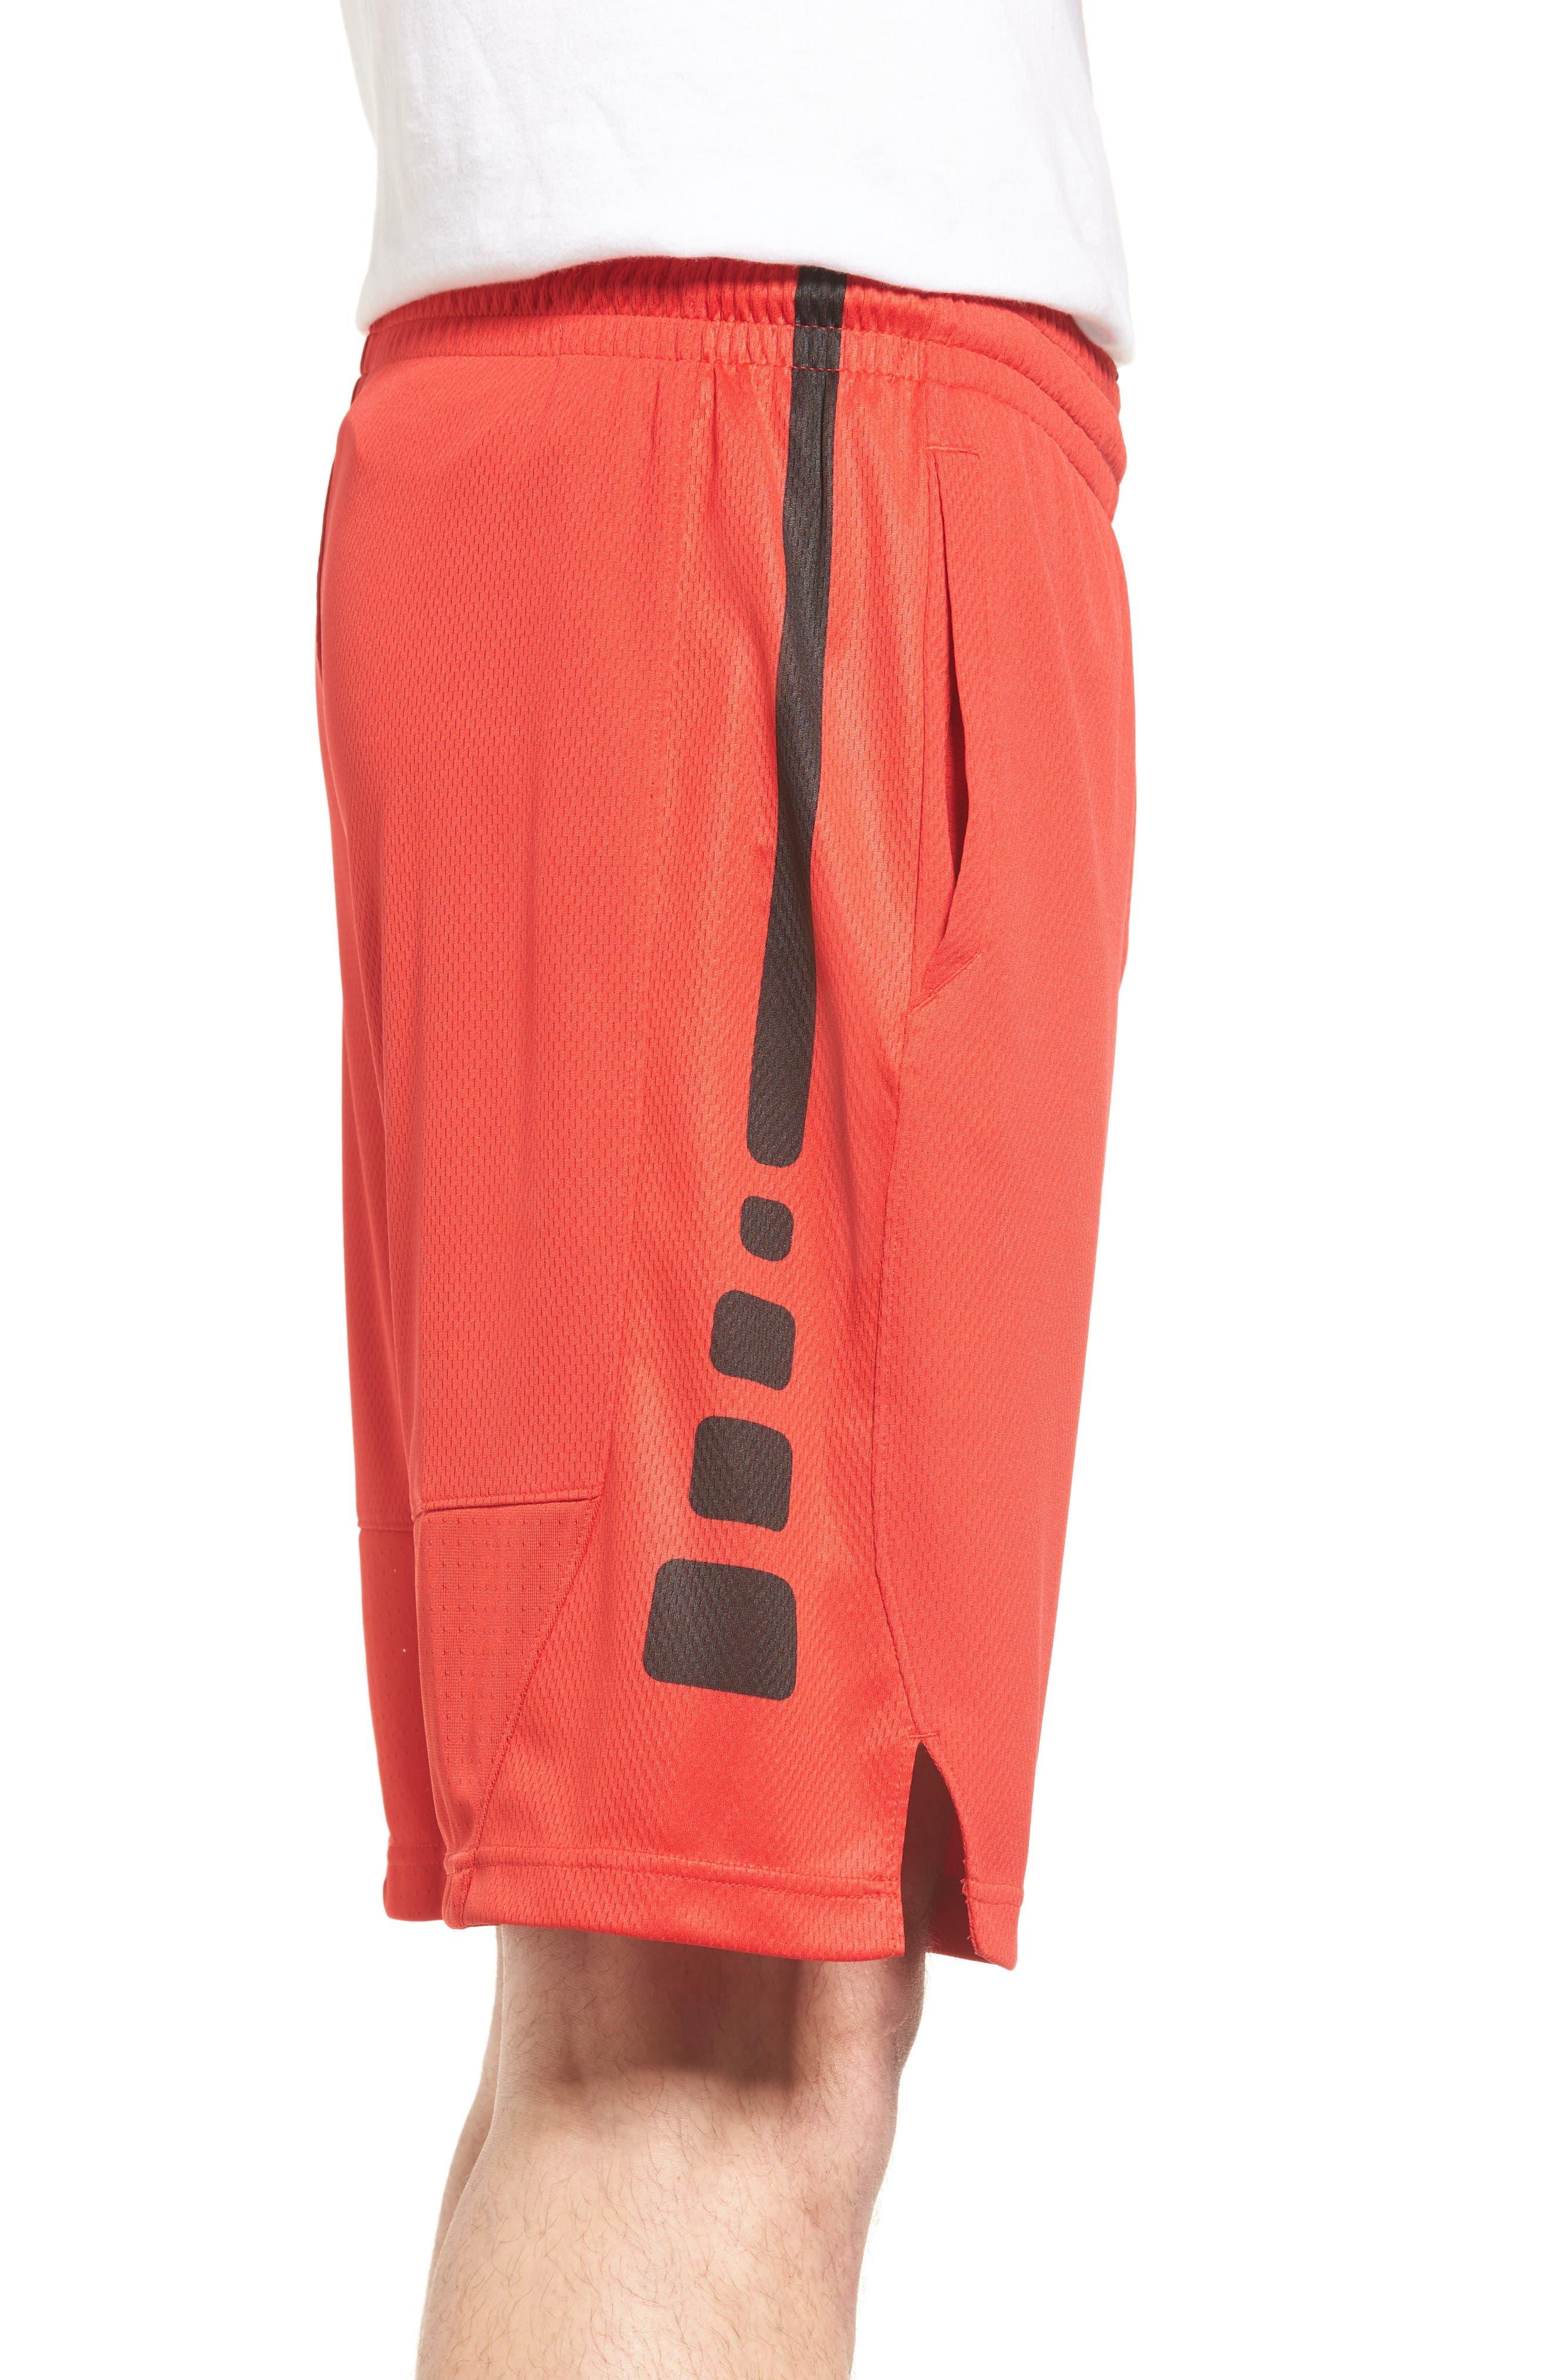 Elite Stripe Basketball Shorts,                             Alternate thumbnail 3, color,                             UNIVERSITY RED/ BLACK